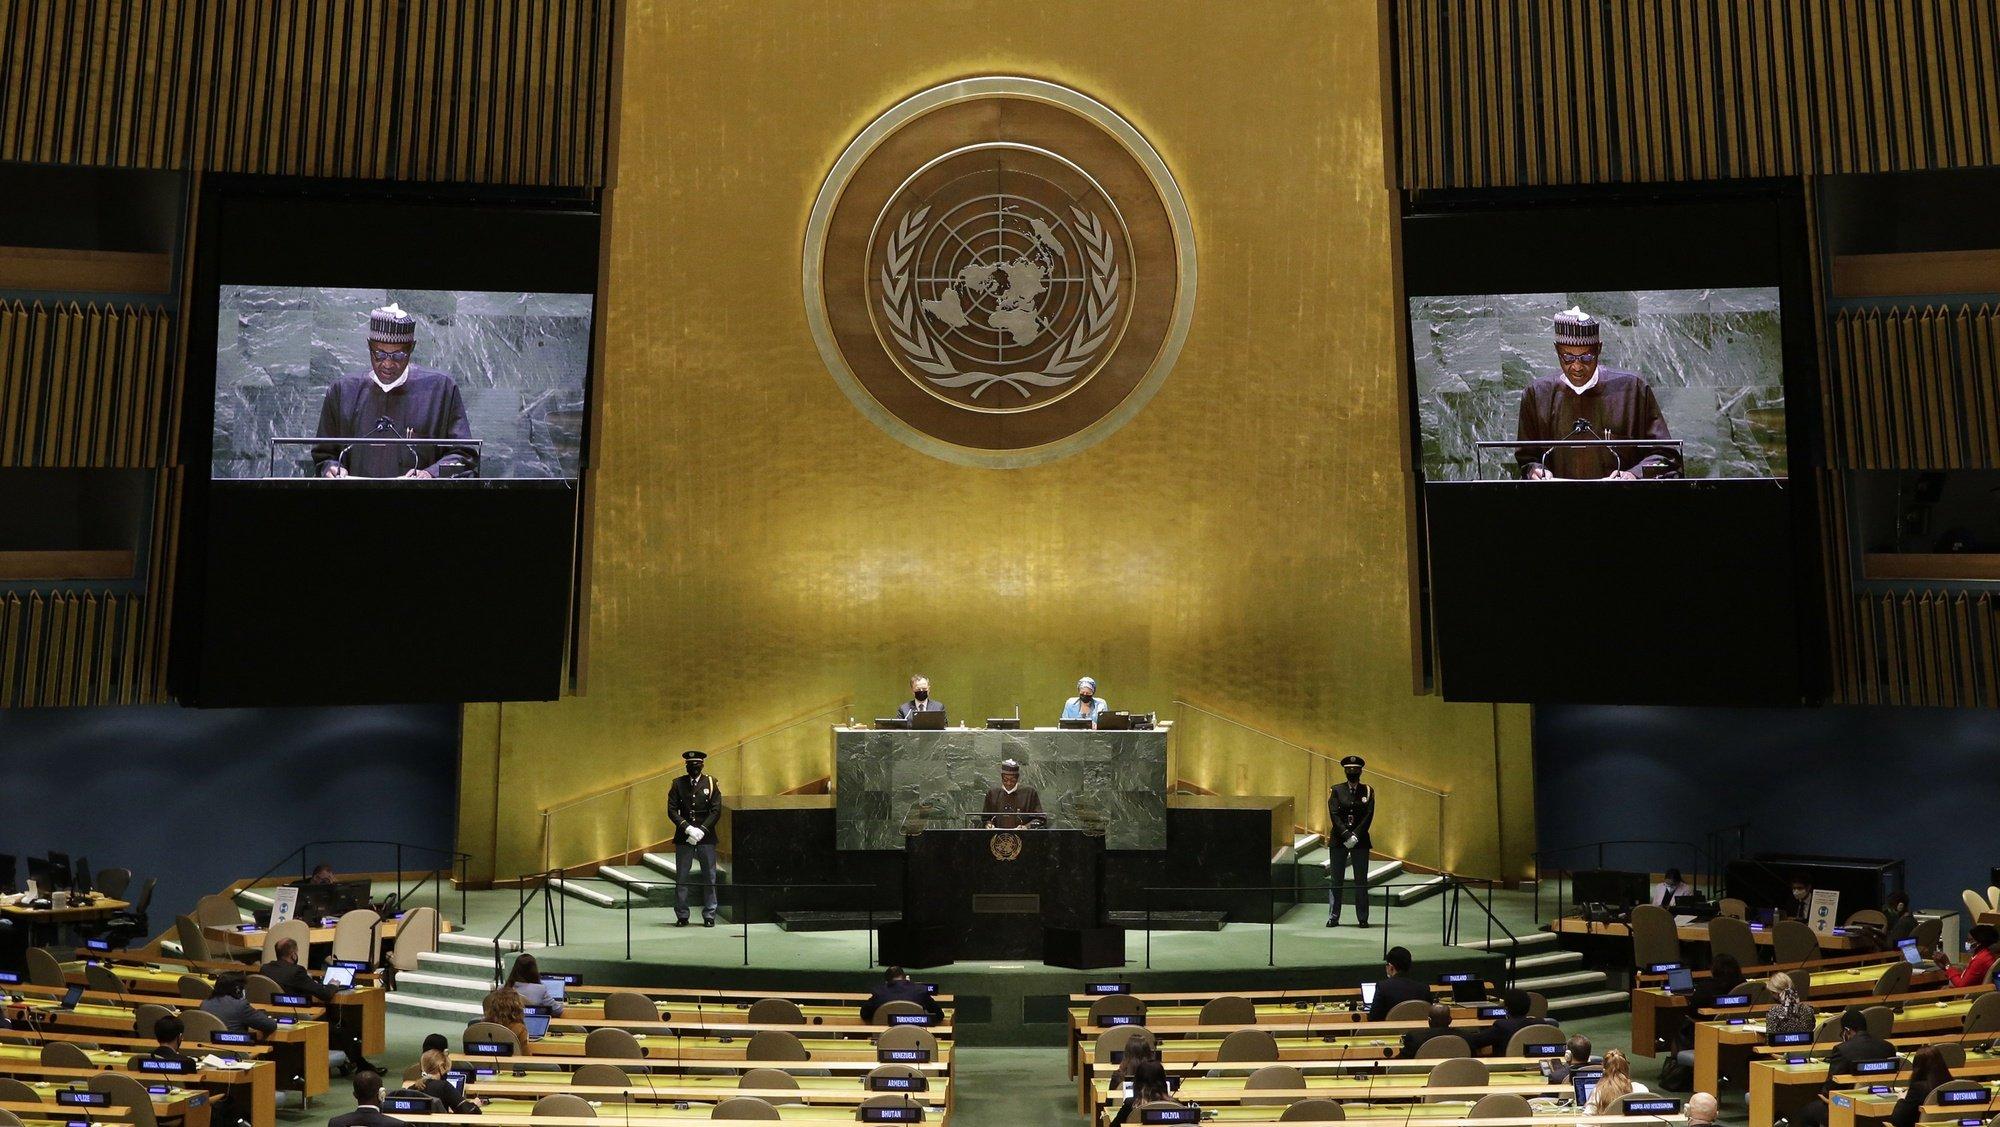 epa09485636 Nigeria's President Muhammadu Buhari  addresses the 76th Session of the United Nations General Assembly, in New York City, New York, USA, 24 September 2021.  EPA/JOHN ANGELILLO / POOL